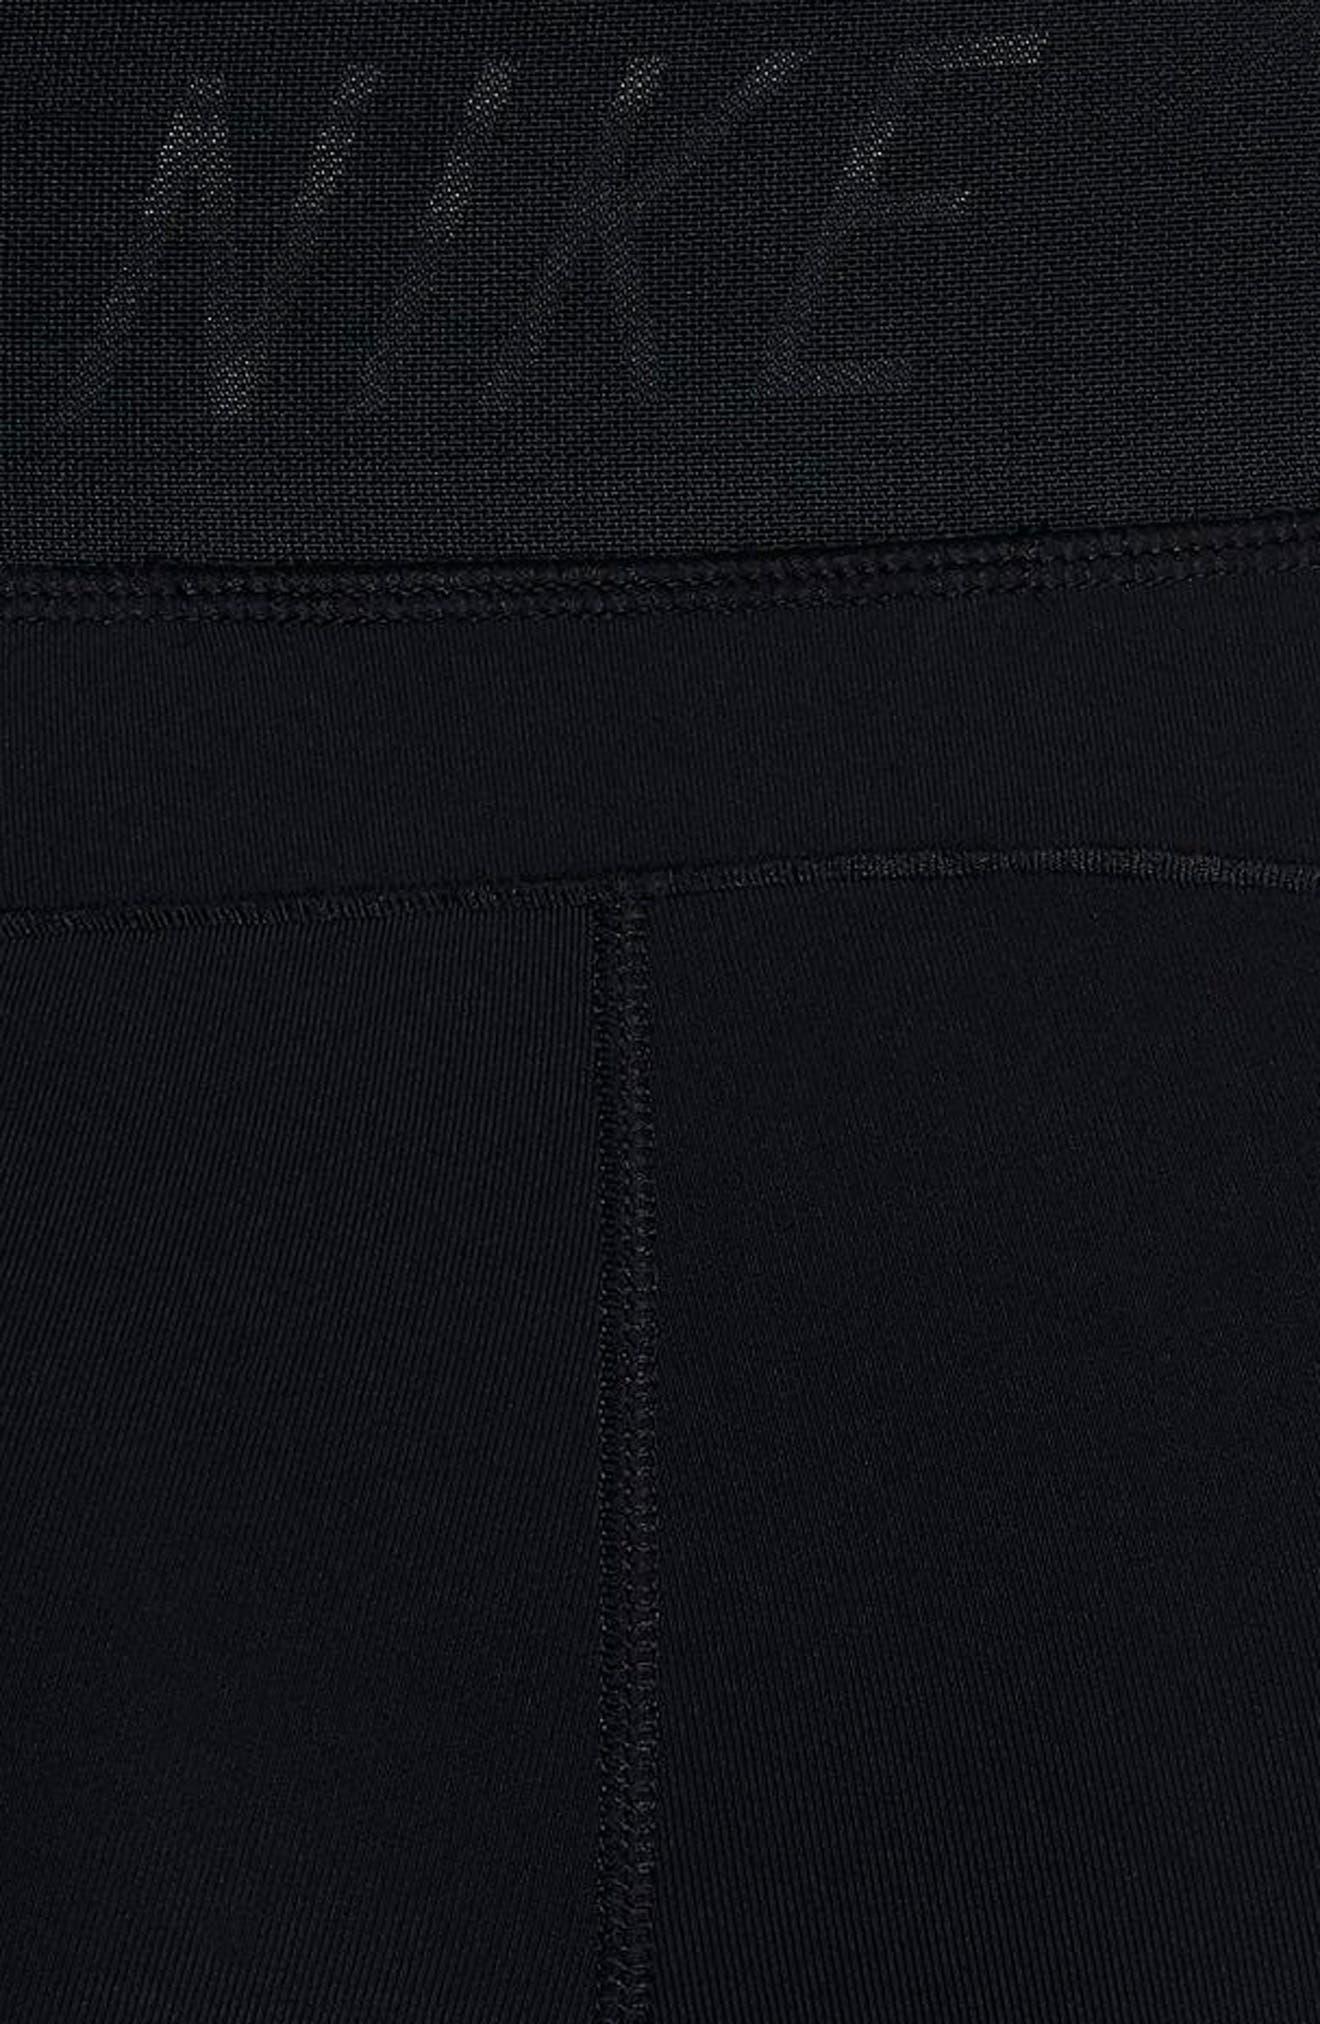 Fly Lux Crop Leggings,                             Alternate thumbnail 6, color,                             Black/ Clear